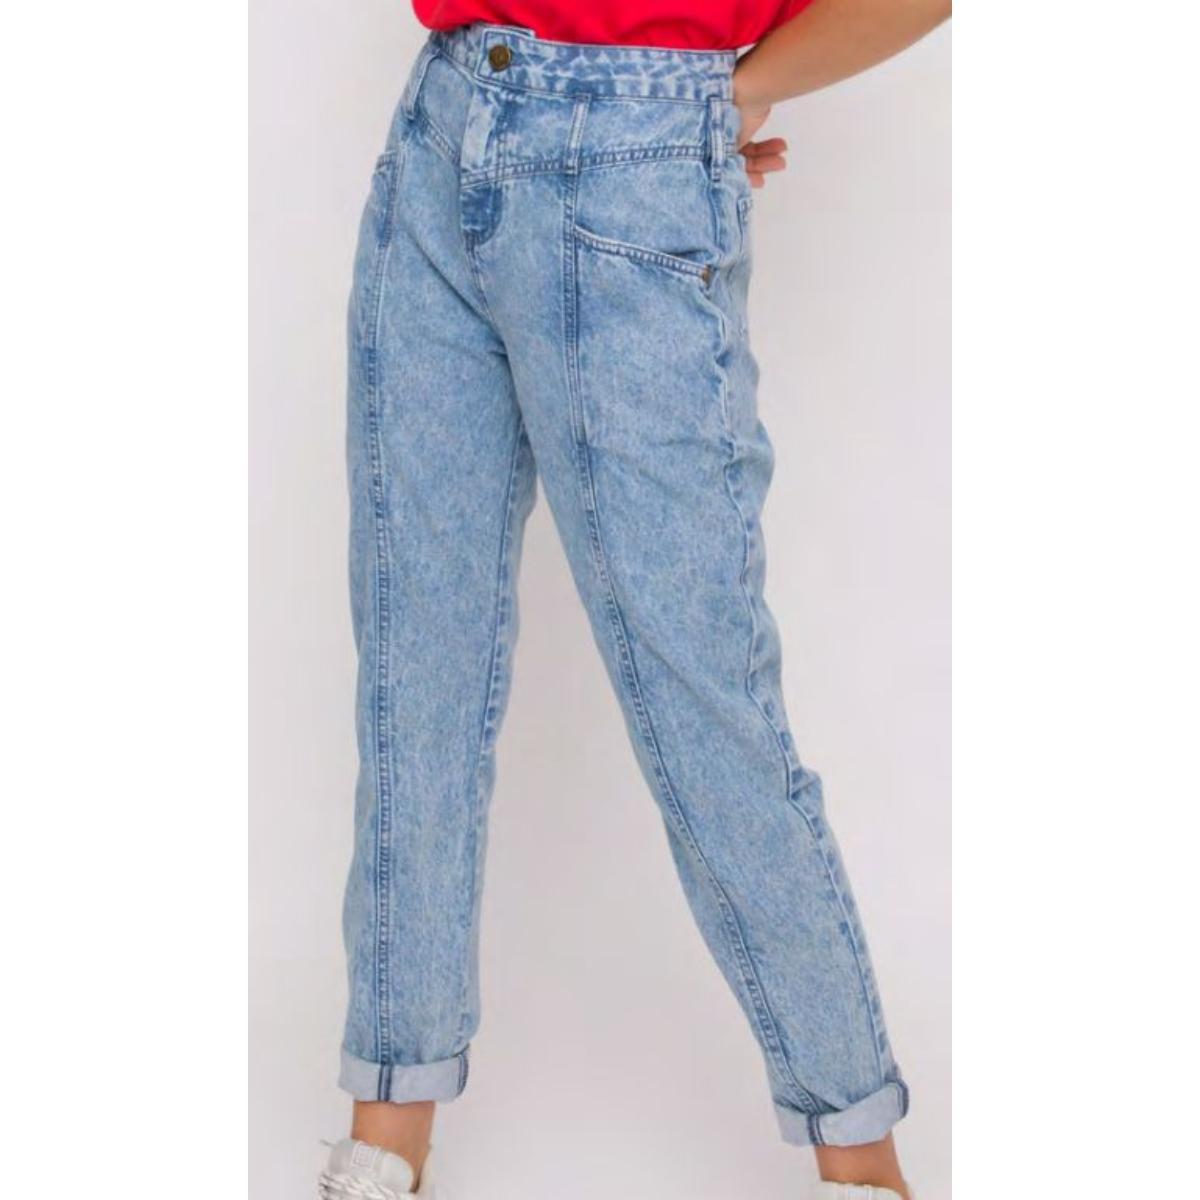 Calça Feminina Coca-cola Clothing 23203319 600 Jeans